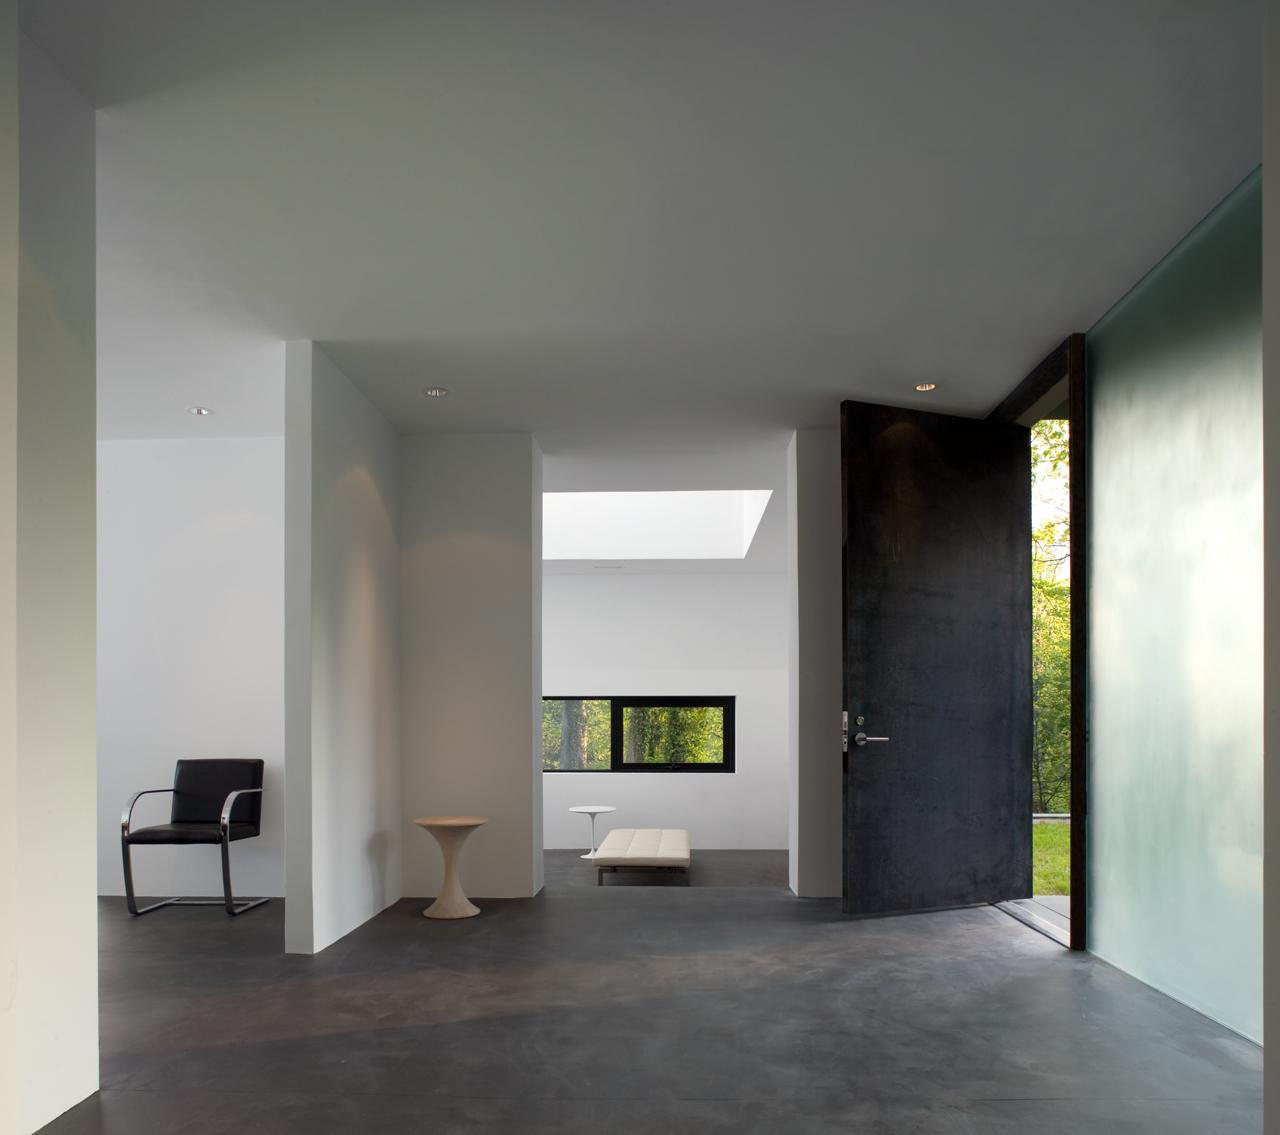 modern interiors Interiorzine is a blog magazine featuring modern interior design, interior decorating ideas, furniture, lighting, flooring, stylish homes, trends and news.